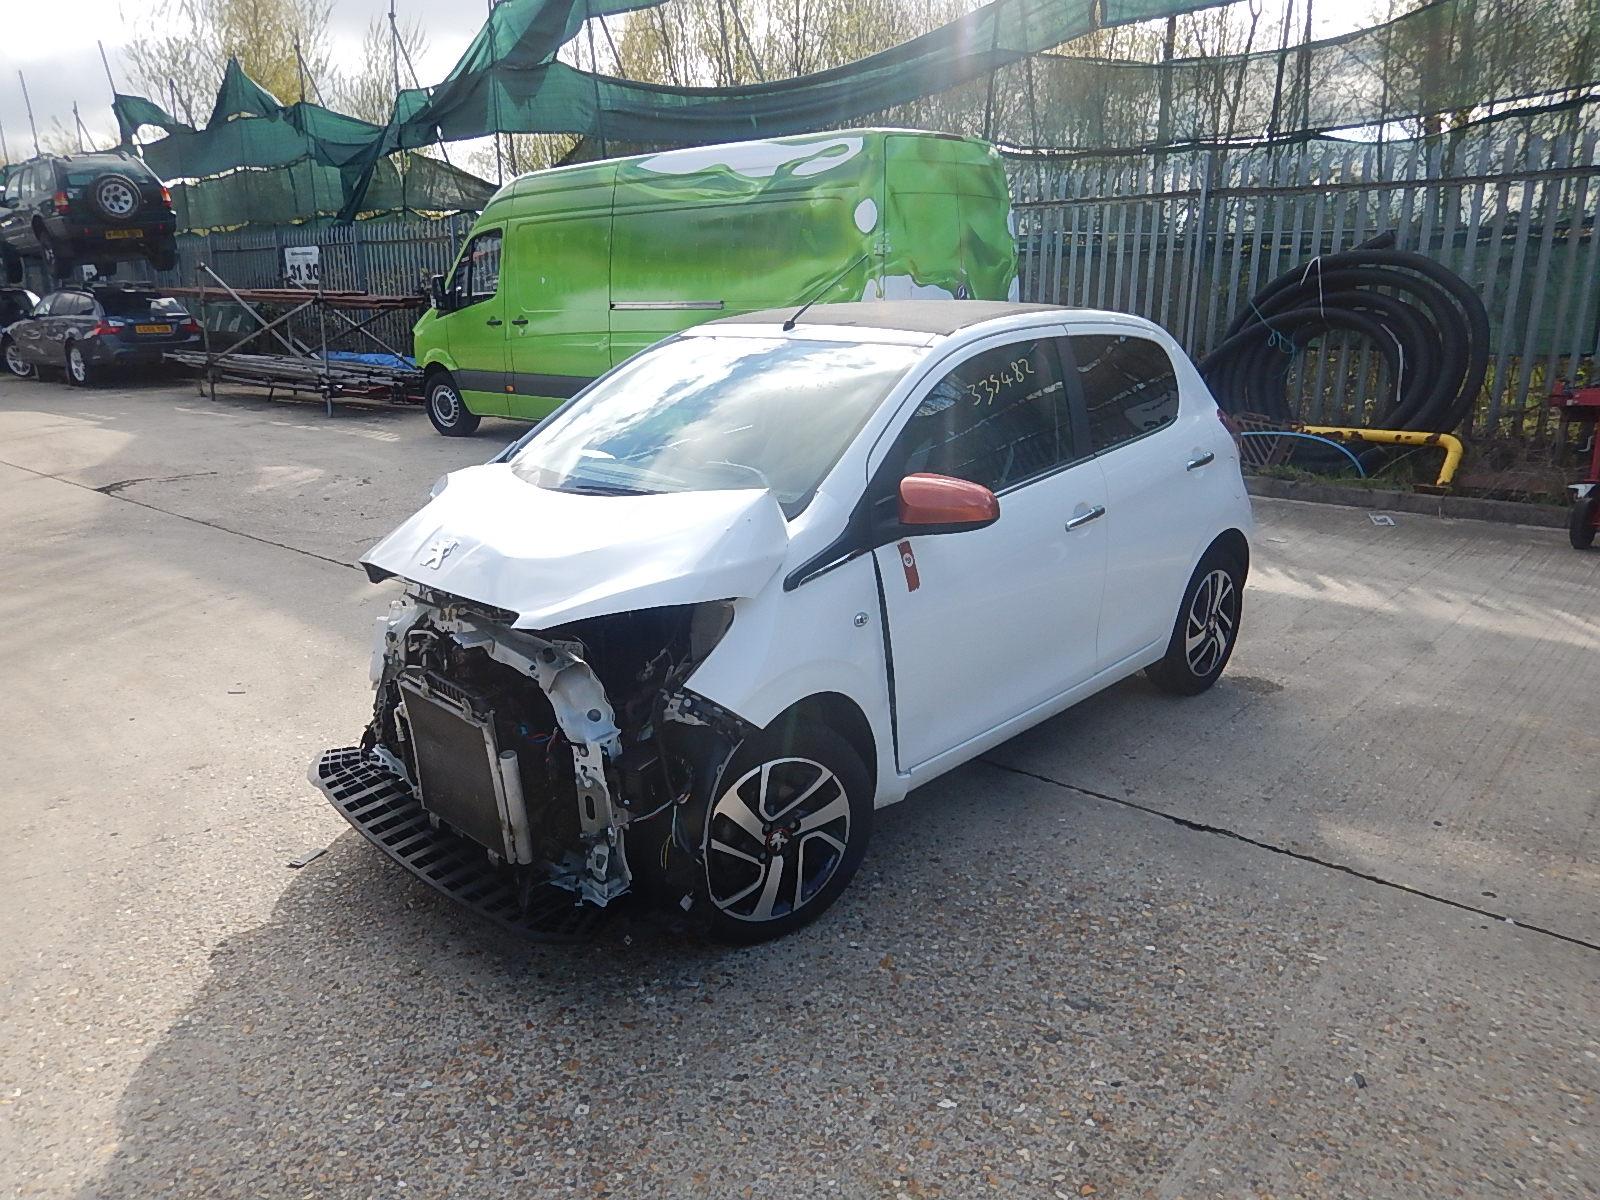 peugeot 108 2014 on top roland garros puretech 5 door hatchback scrap salvage car for sale. Black Bedroom Furniture Sets. Home Design Ideas